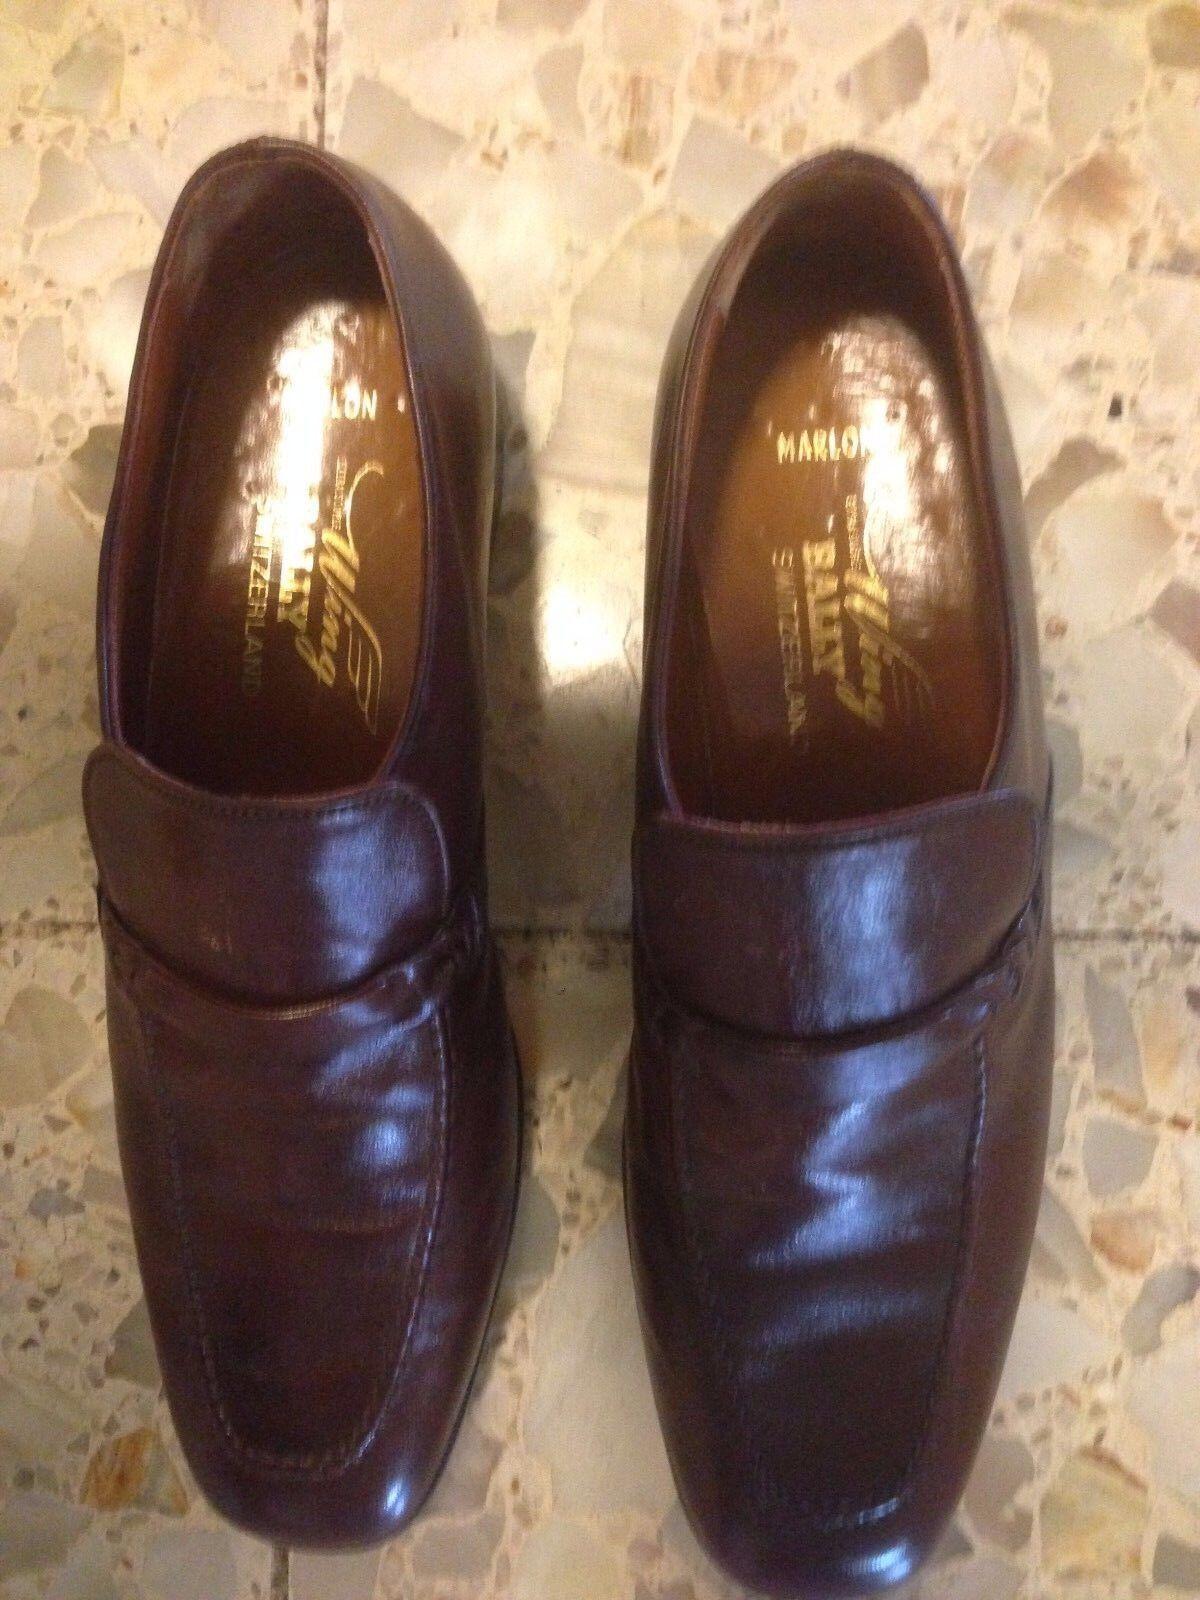 Scarpe casual da uomo  BALLYS uomoS SHOES 7.5 marlon extra souple wing brown loaffer